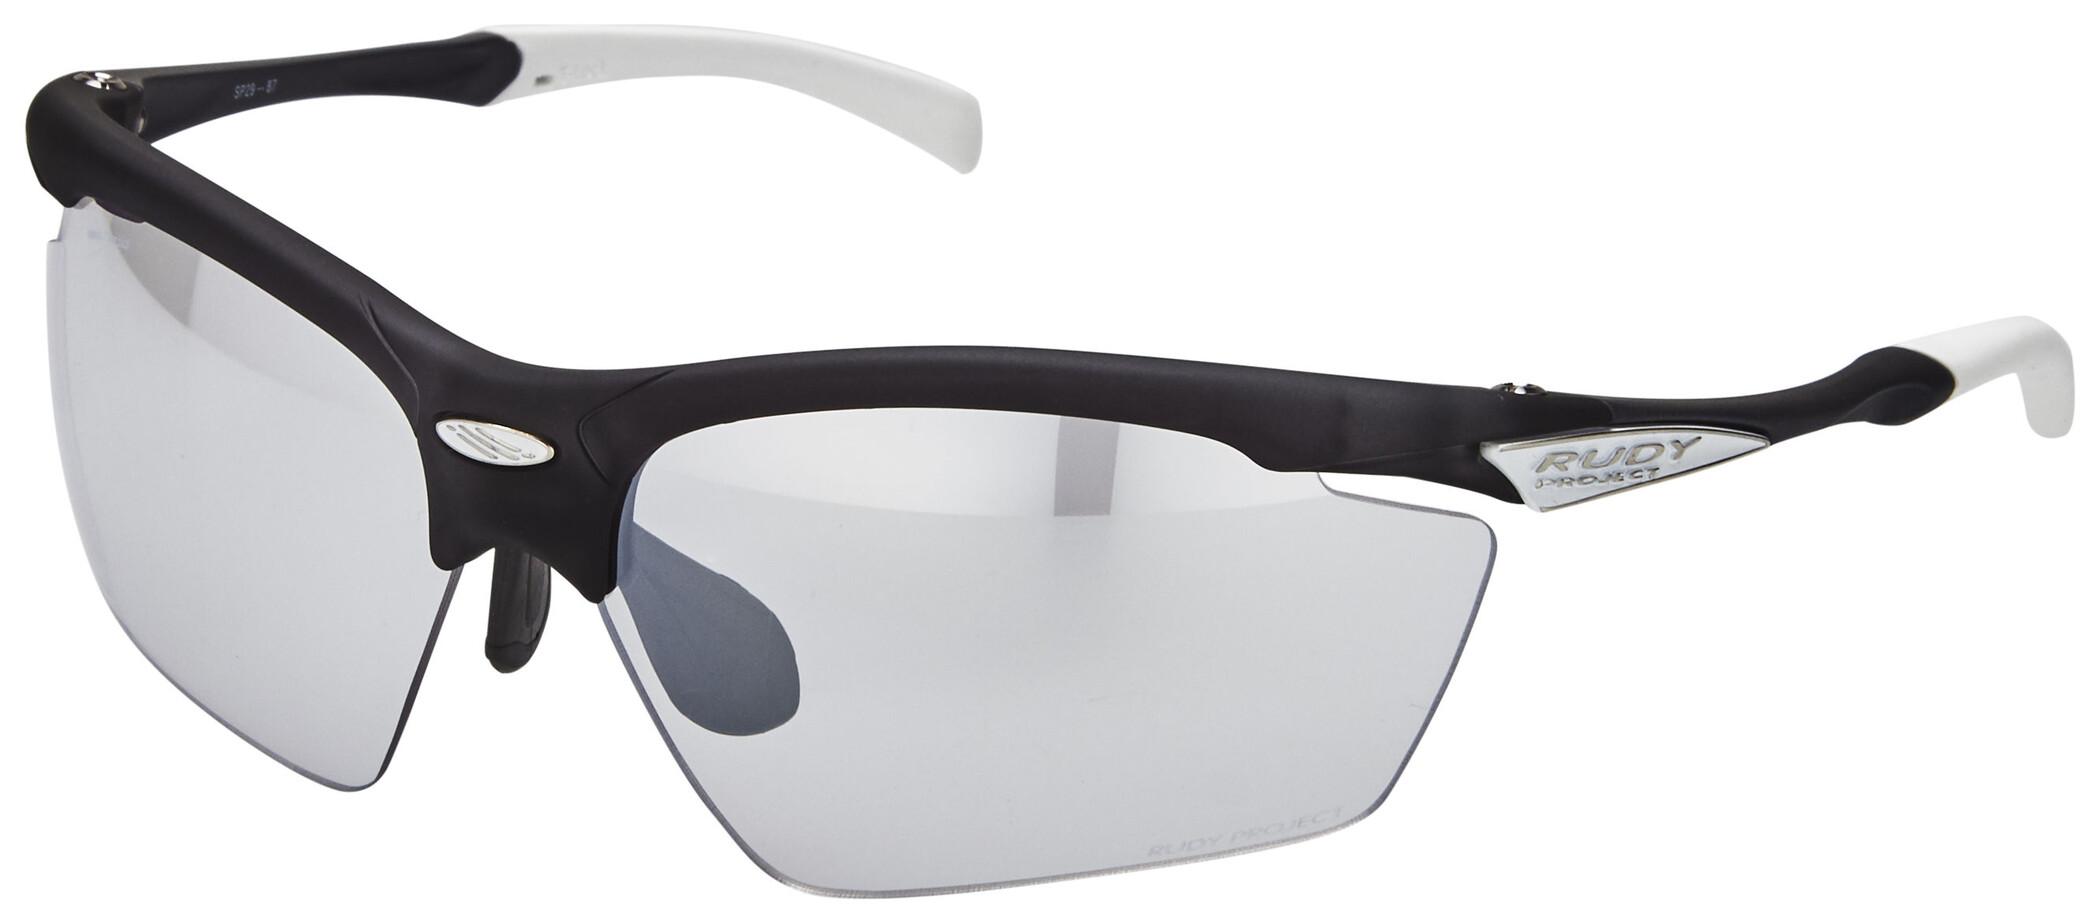 1e6045c4baf Rudy Project Agon Glasses Frozen Ash - ImpactX Photochromic 2 Laser Black.jpg